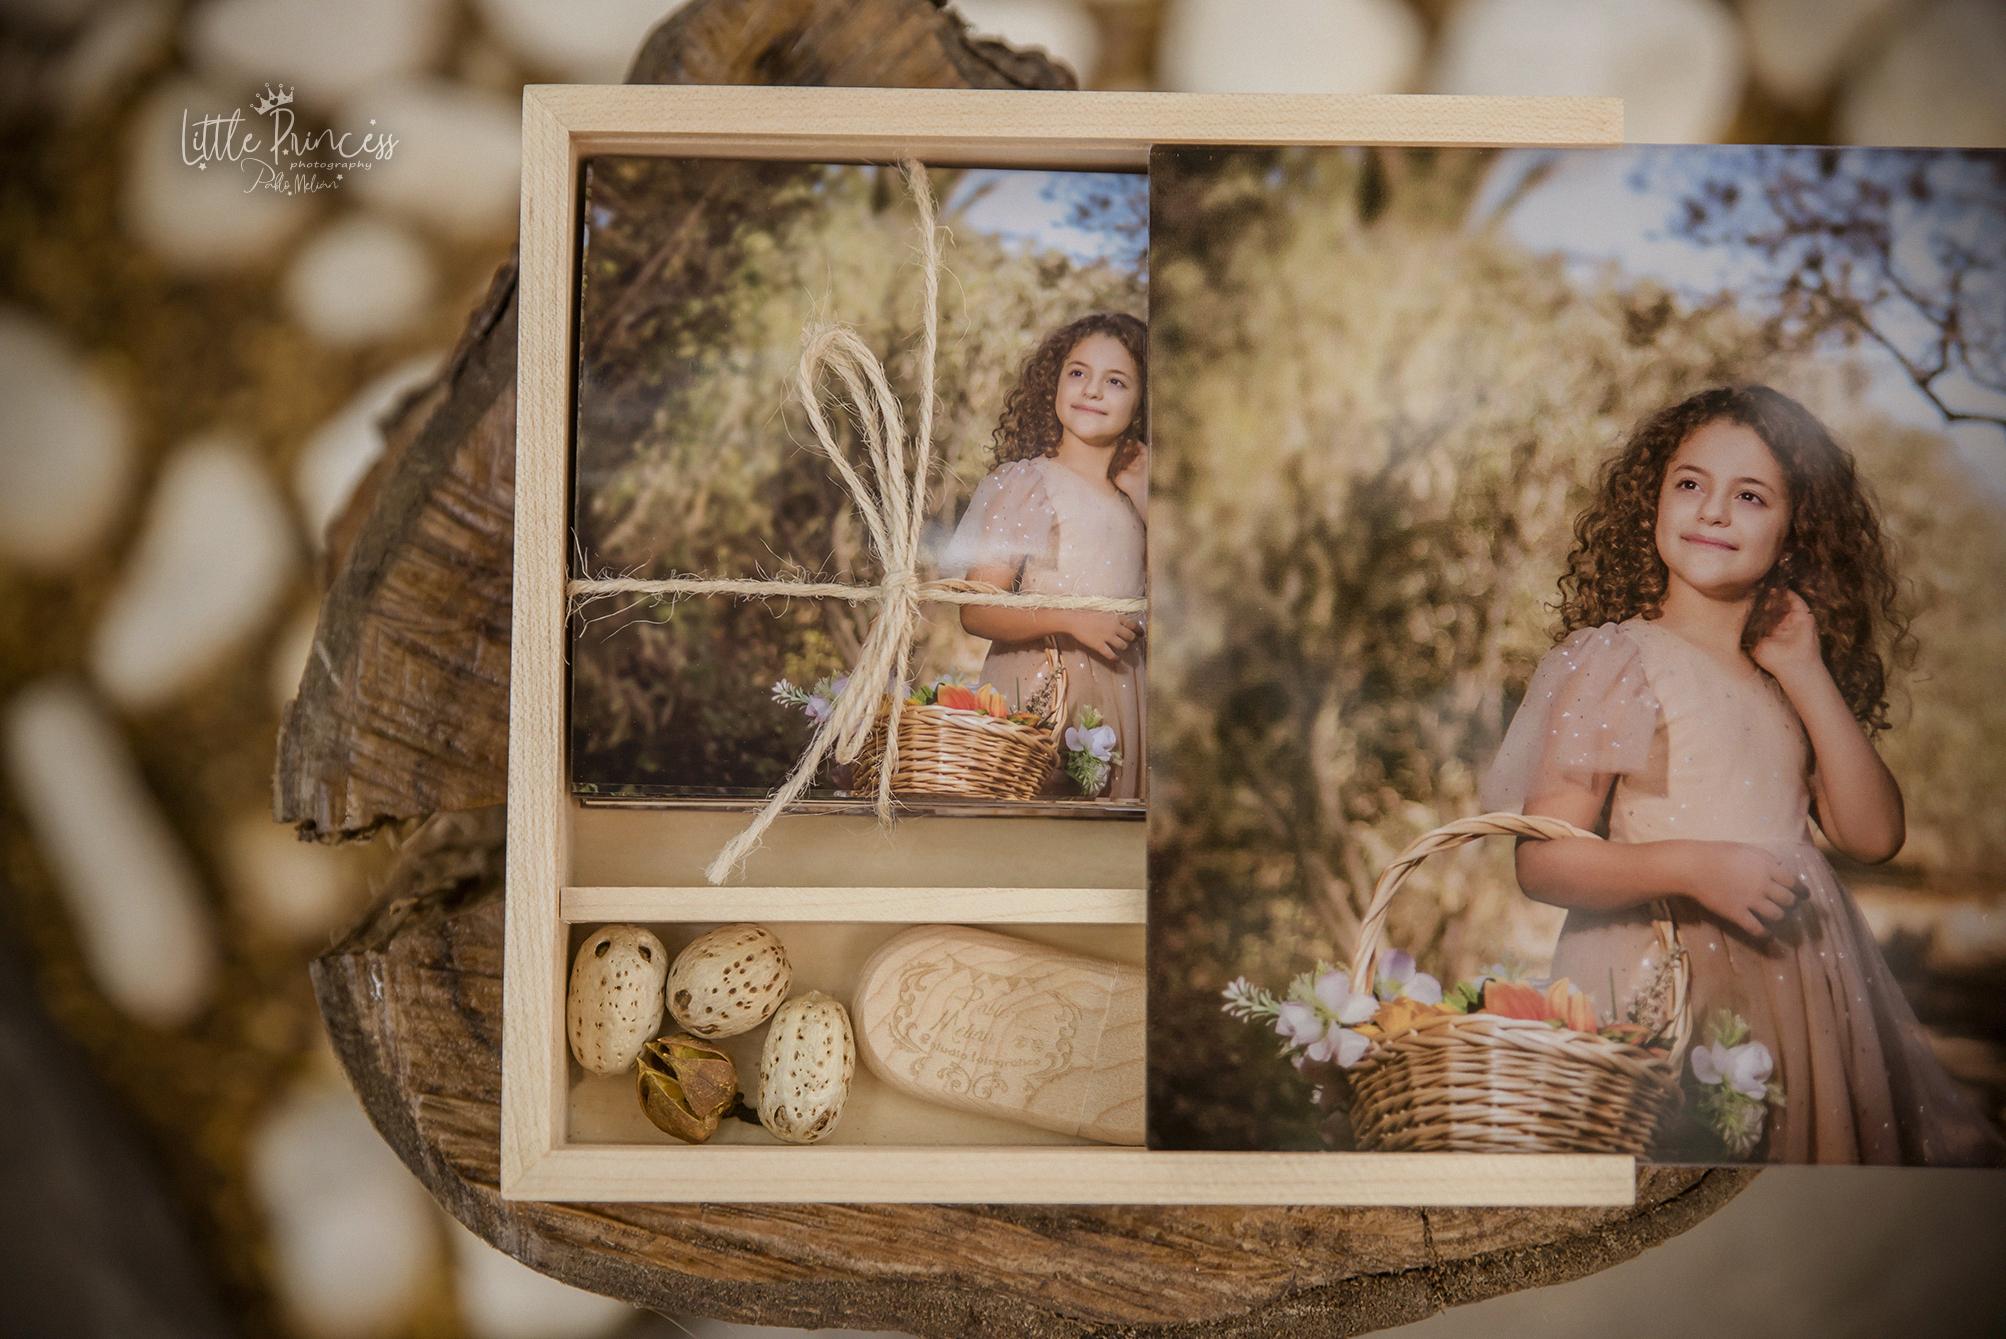 packaging little prince photography - estudio fotográfico en Tenerife